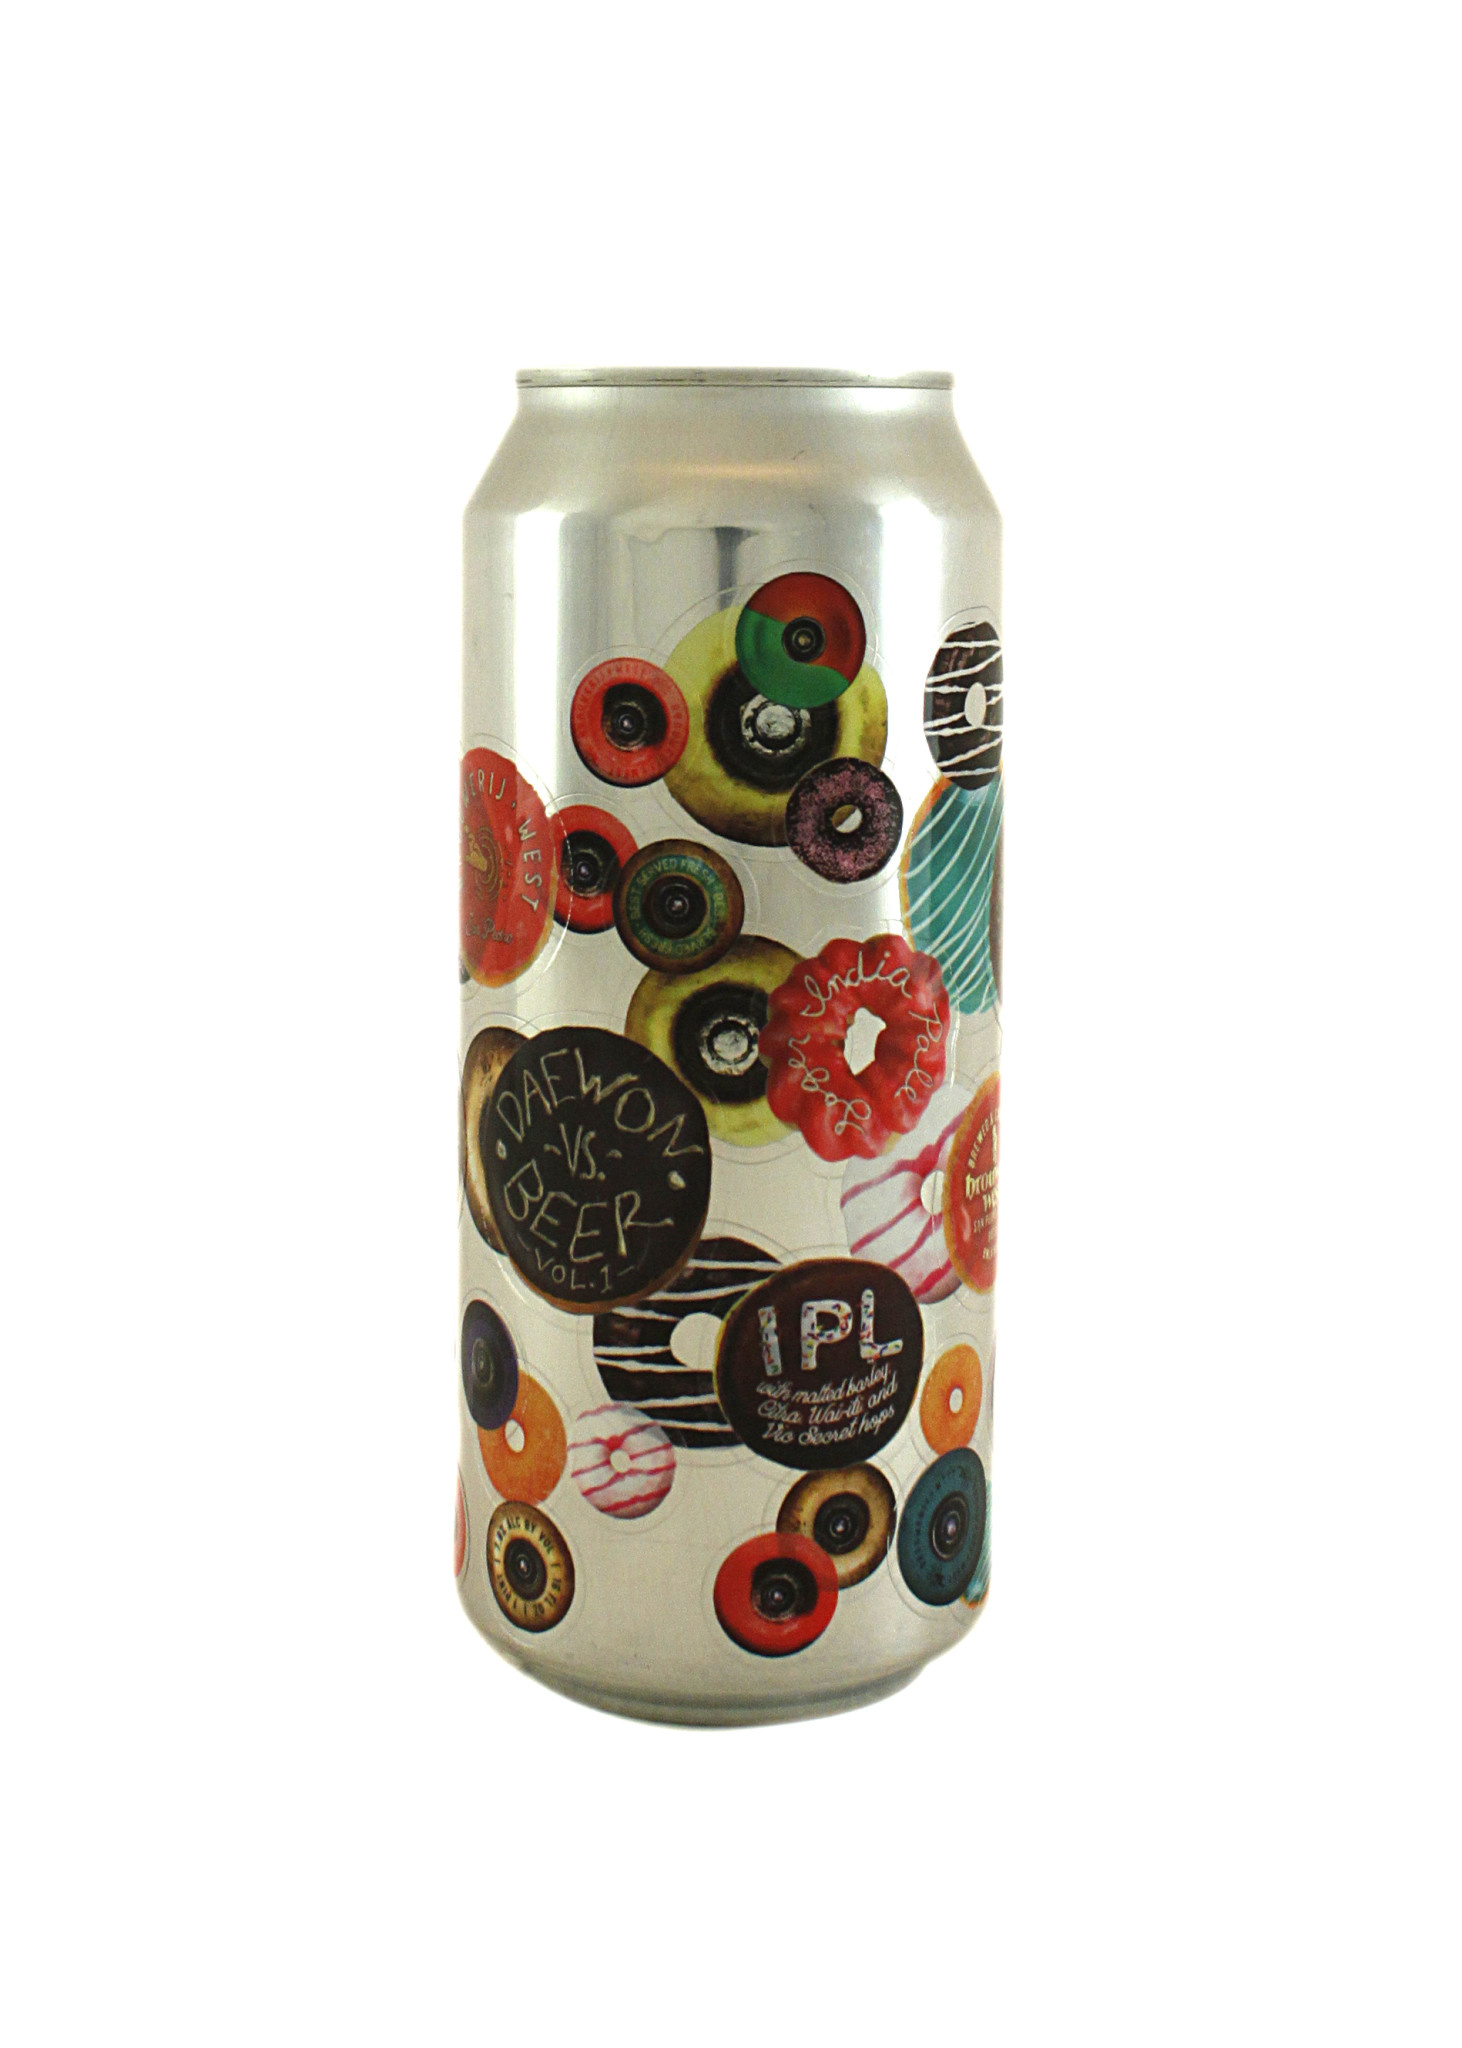 "Brouwerij West ""Daewon Vs. Beer- Volume 1"" Hoppy Lager (IPL) 16oz can- San Pedro, CA"